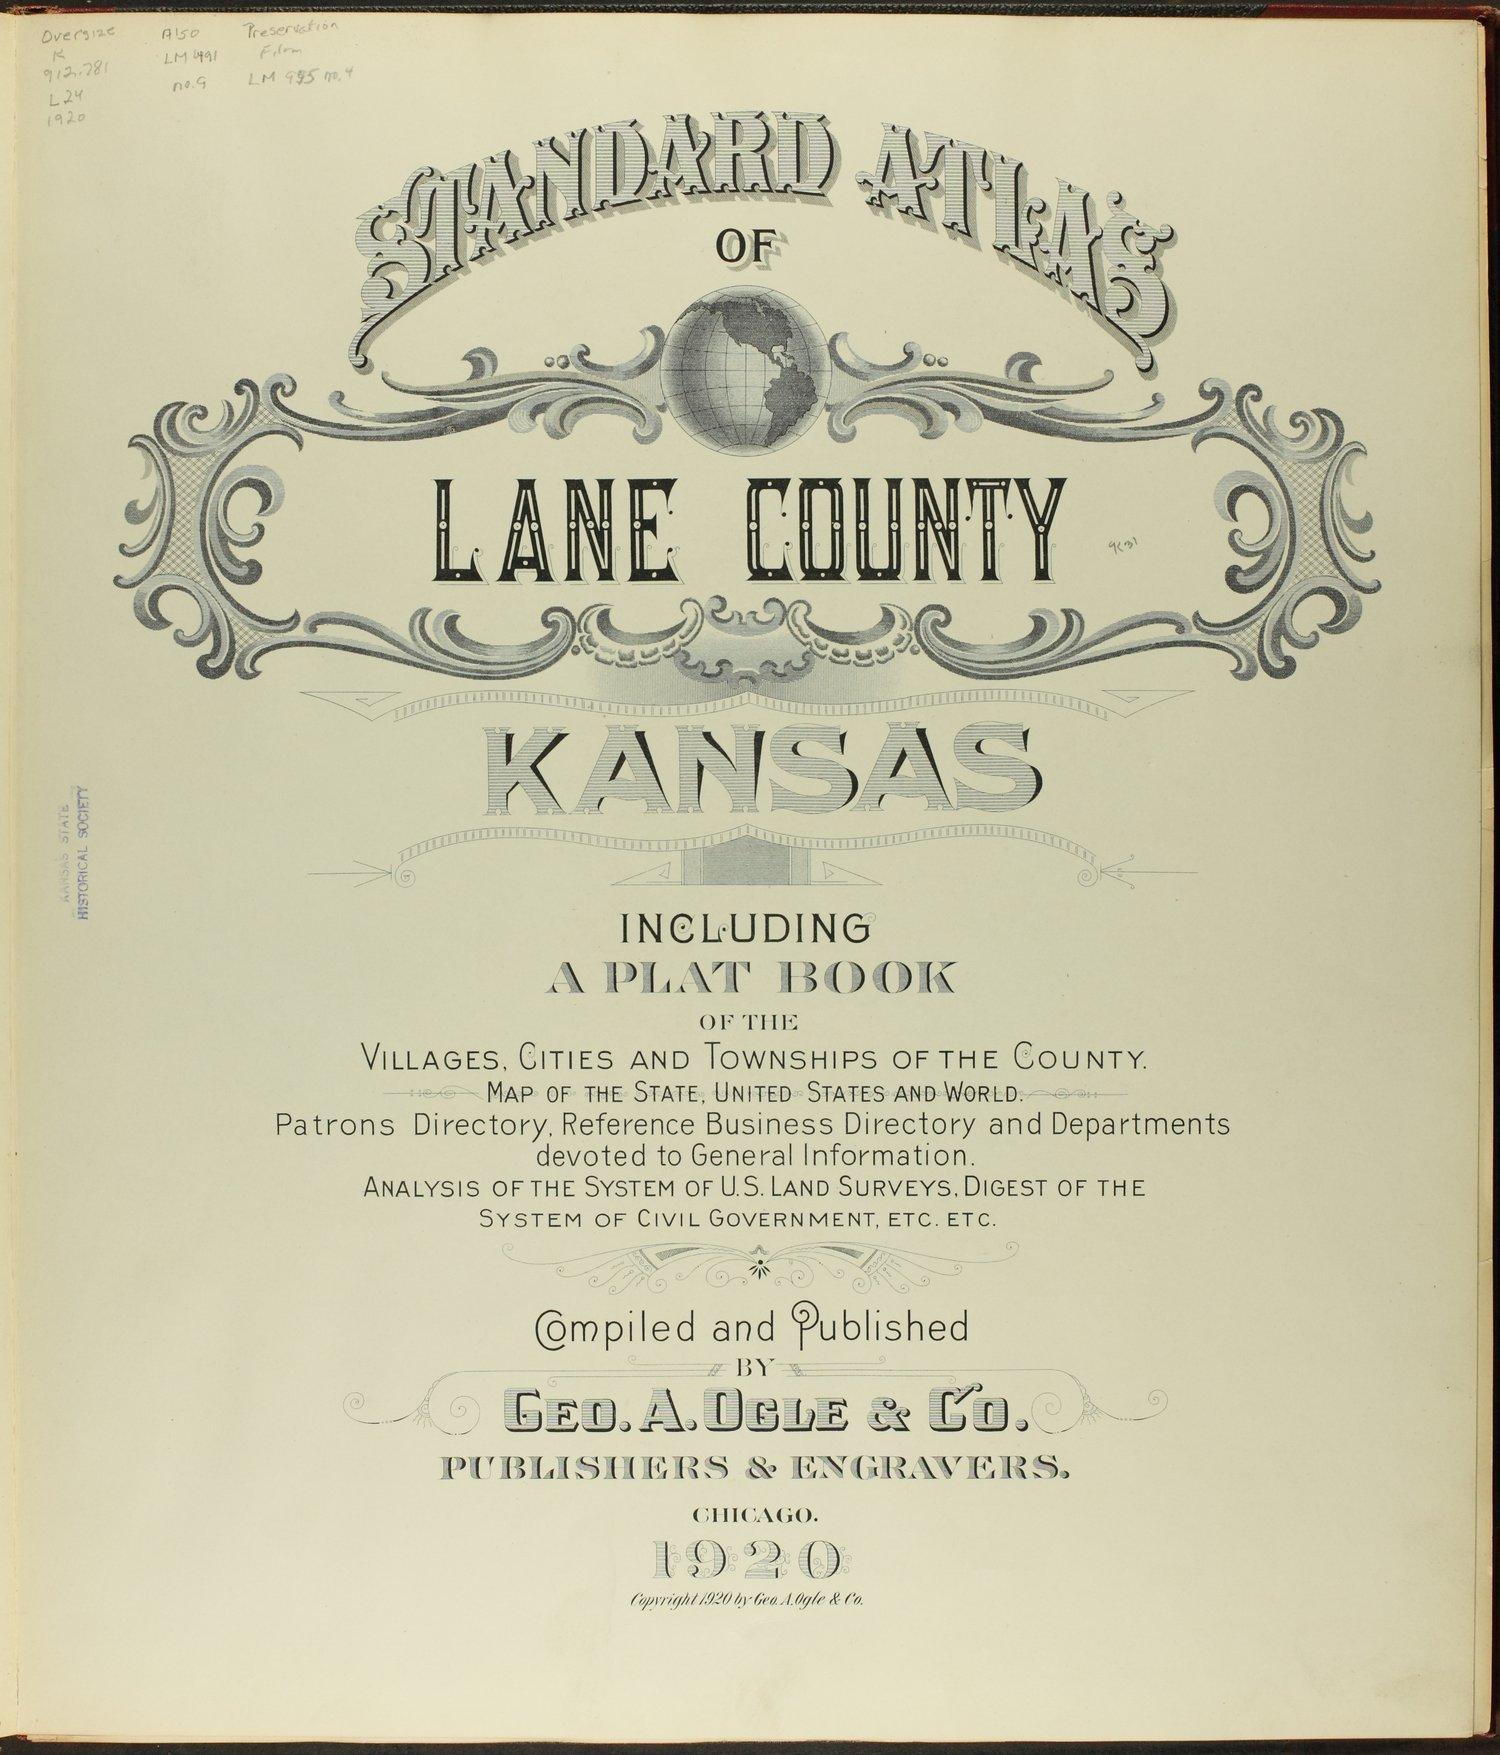 Standard atlas of Lane county, Kansas - Title Page